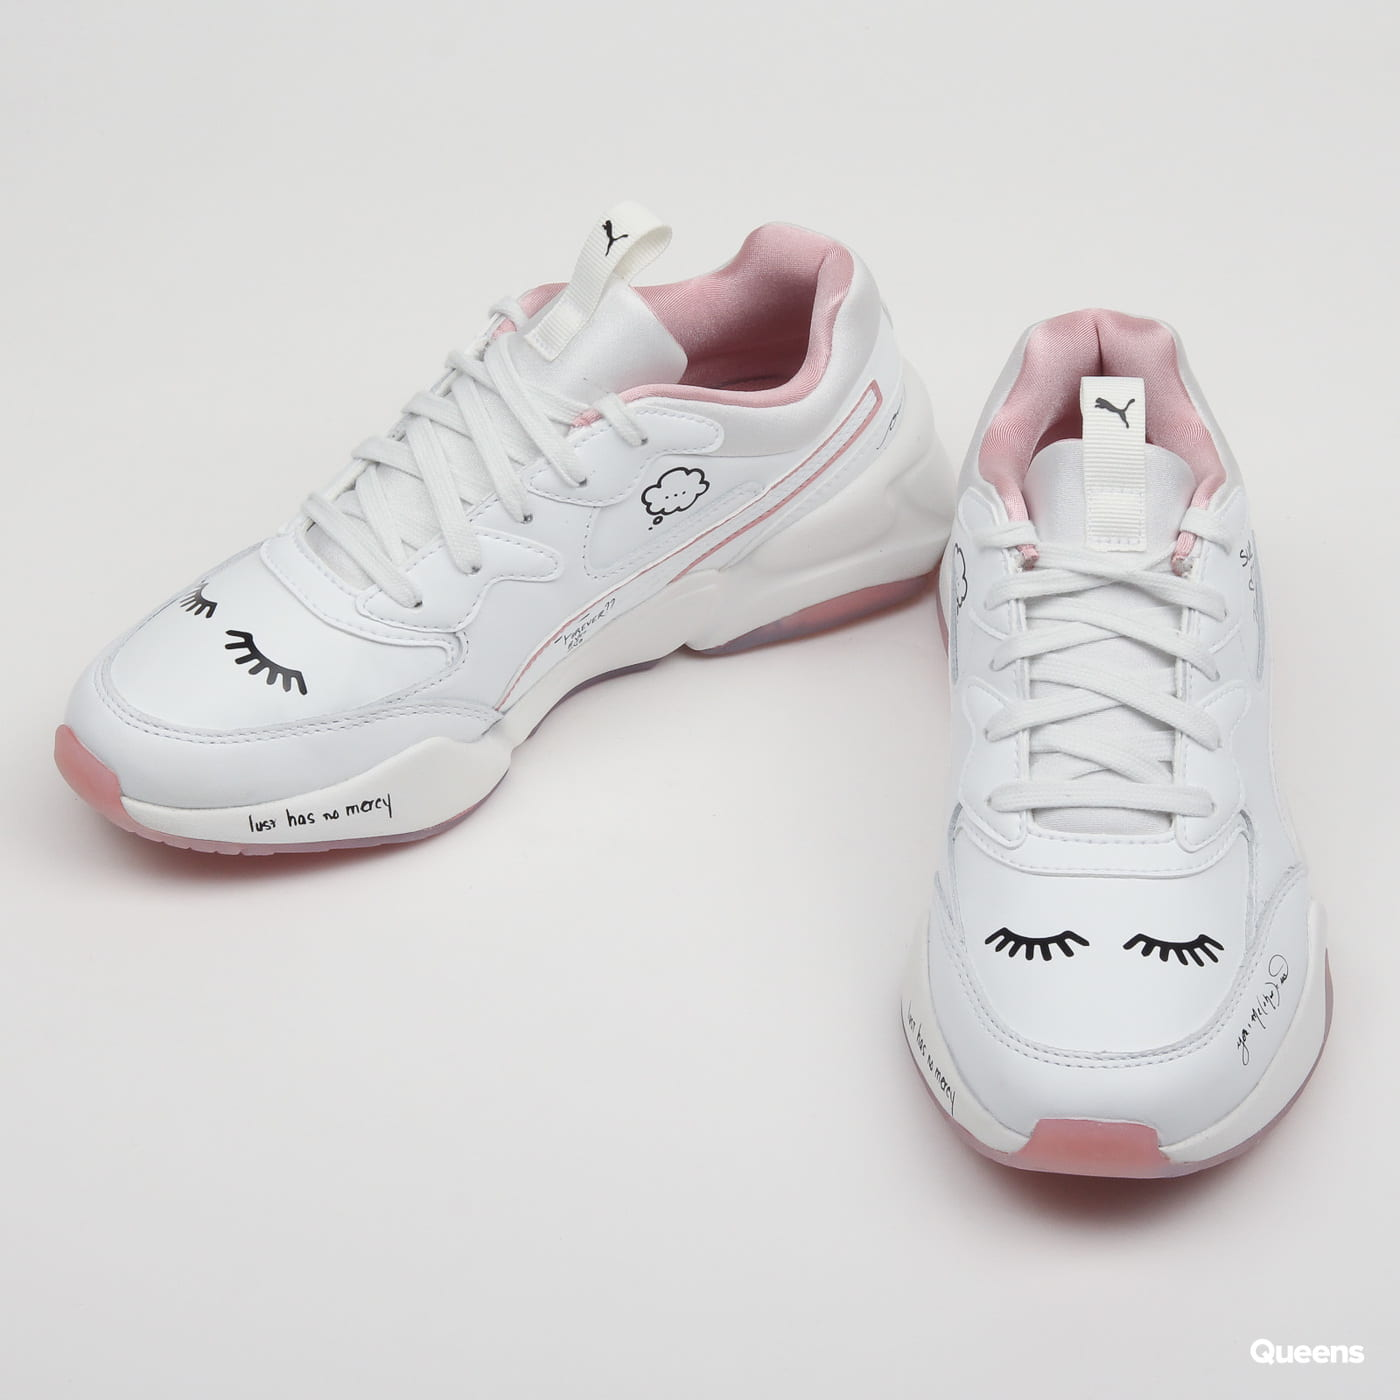 puma x sue tsai nova women's sneakers